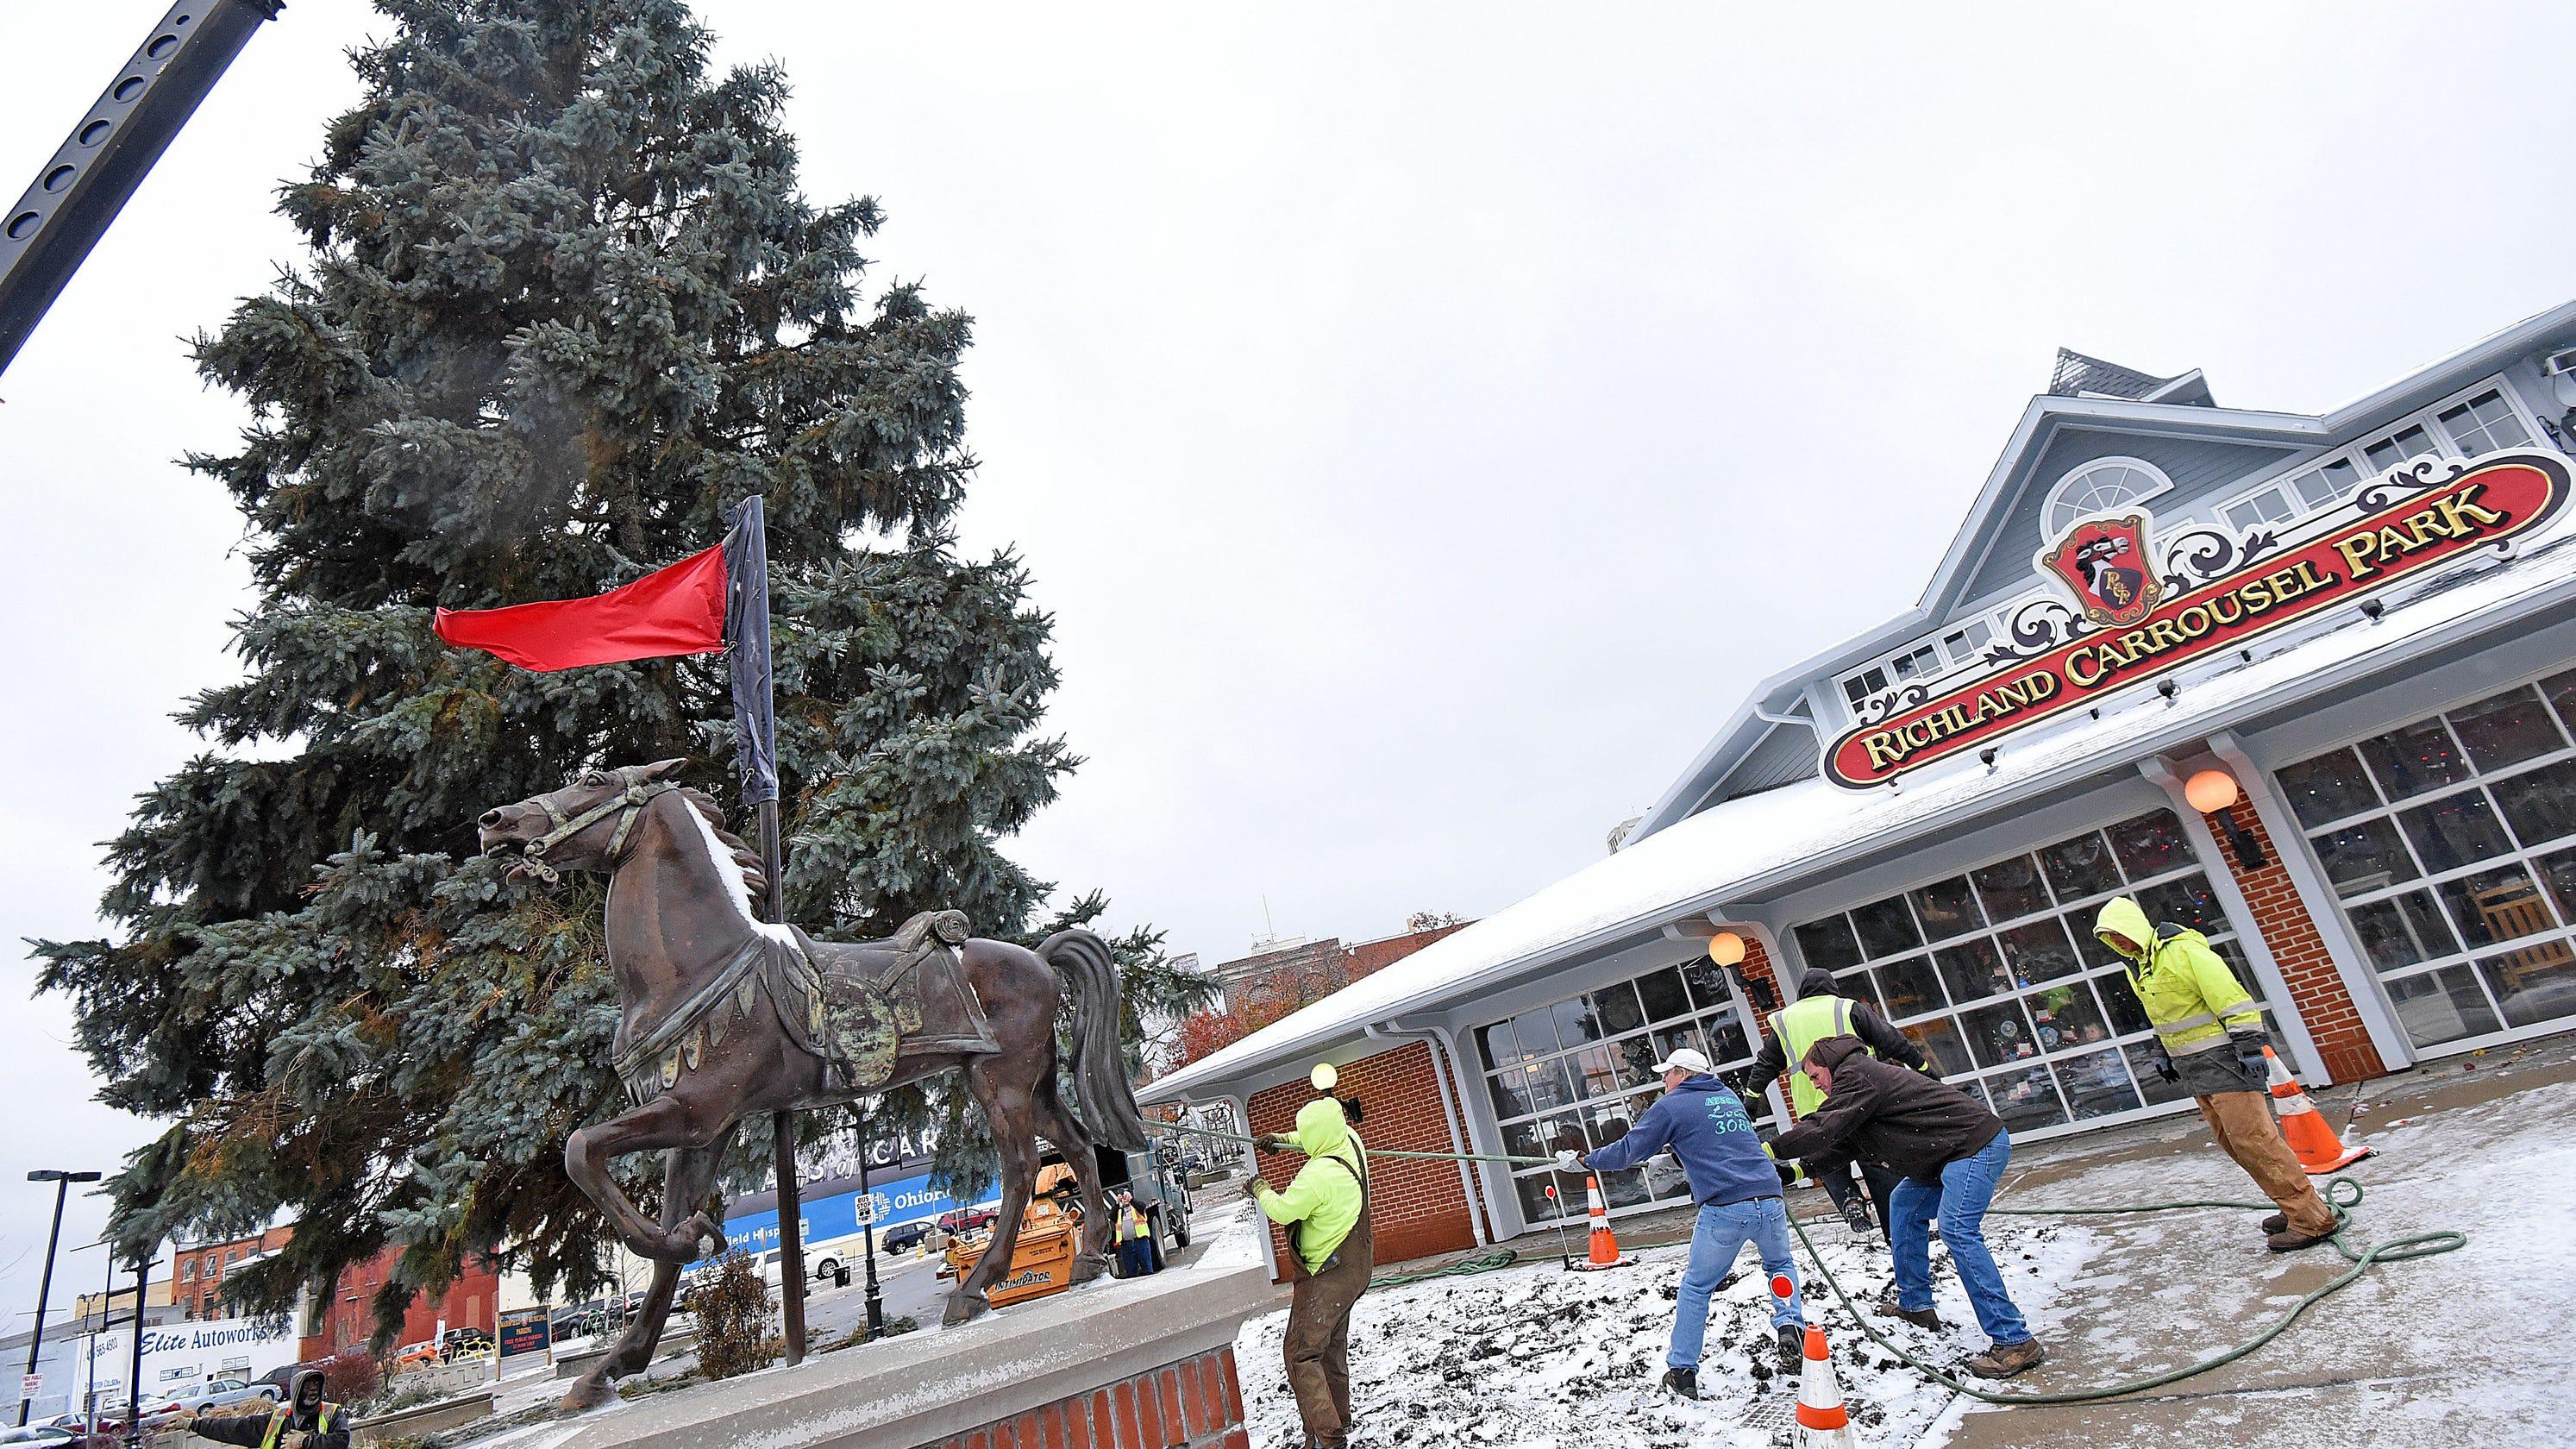 Sherman Avenue resident donates Richland Carrousel Park Christmas tree